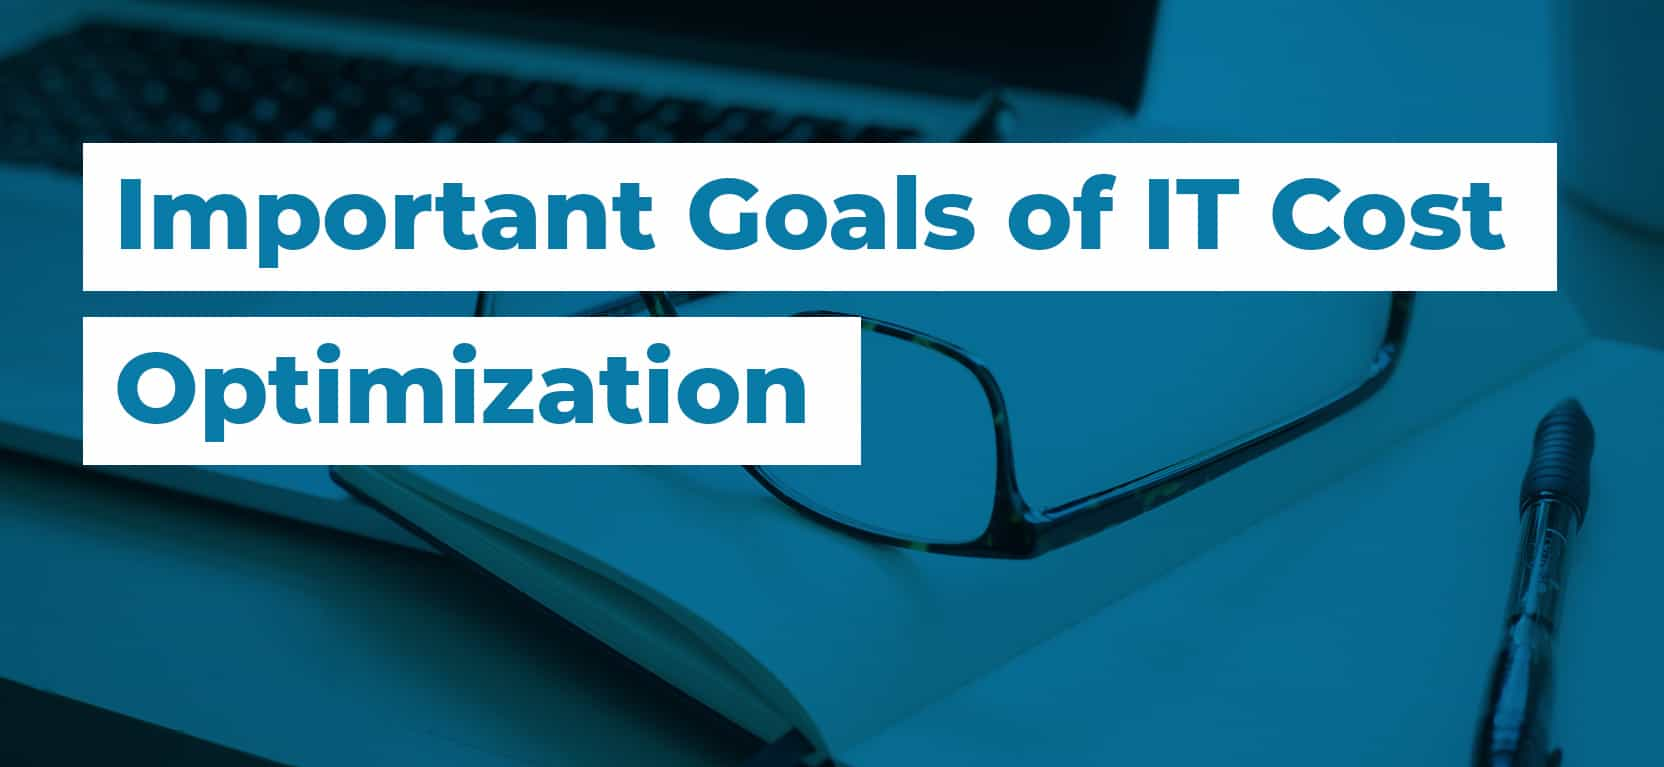 36 Important Goals of IT Cost Optimization3